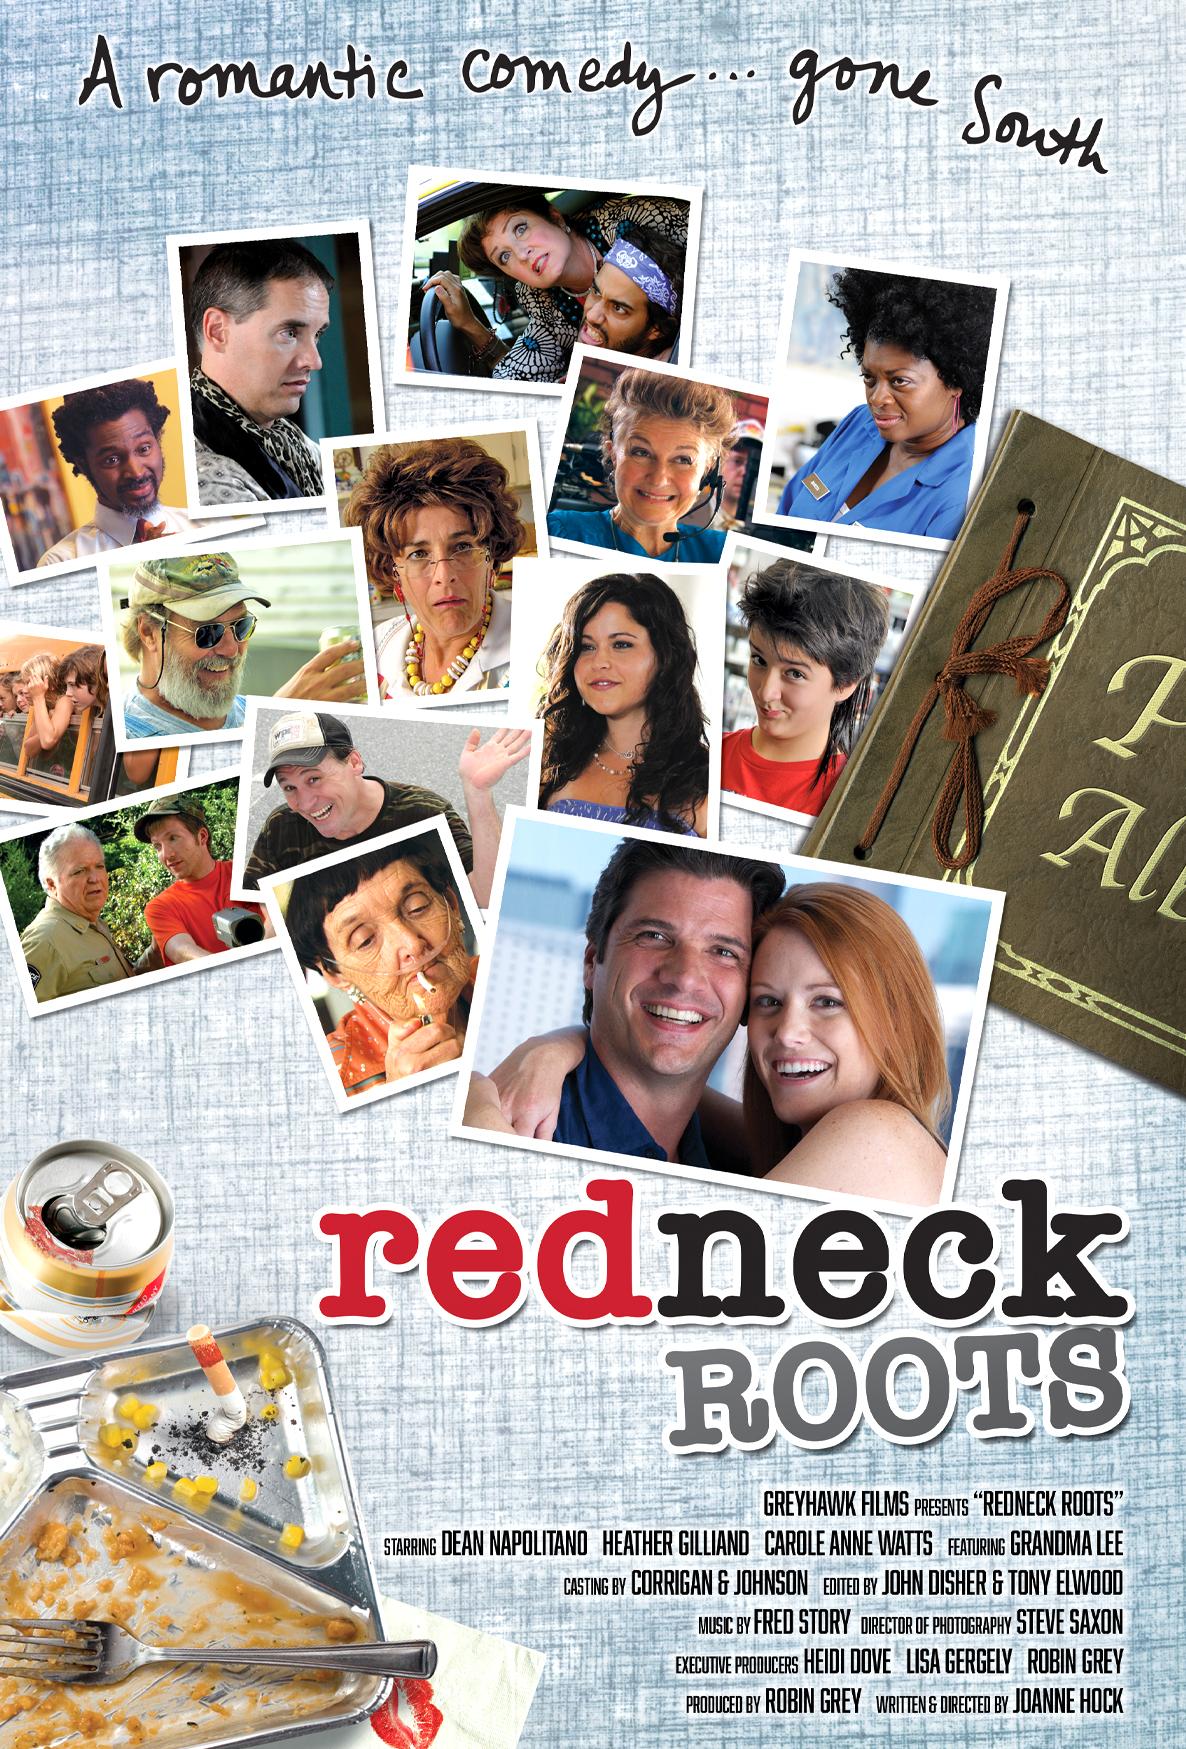 Joanne Hock, Joanne Hock Films, Director, Redneck Roots, Comedy, Southern Comedy, Redneck Humor